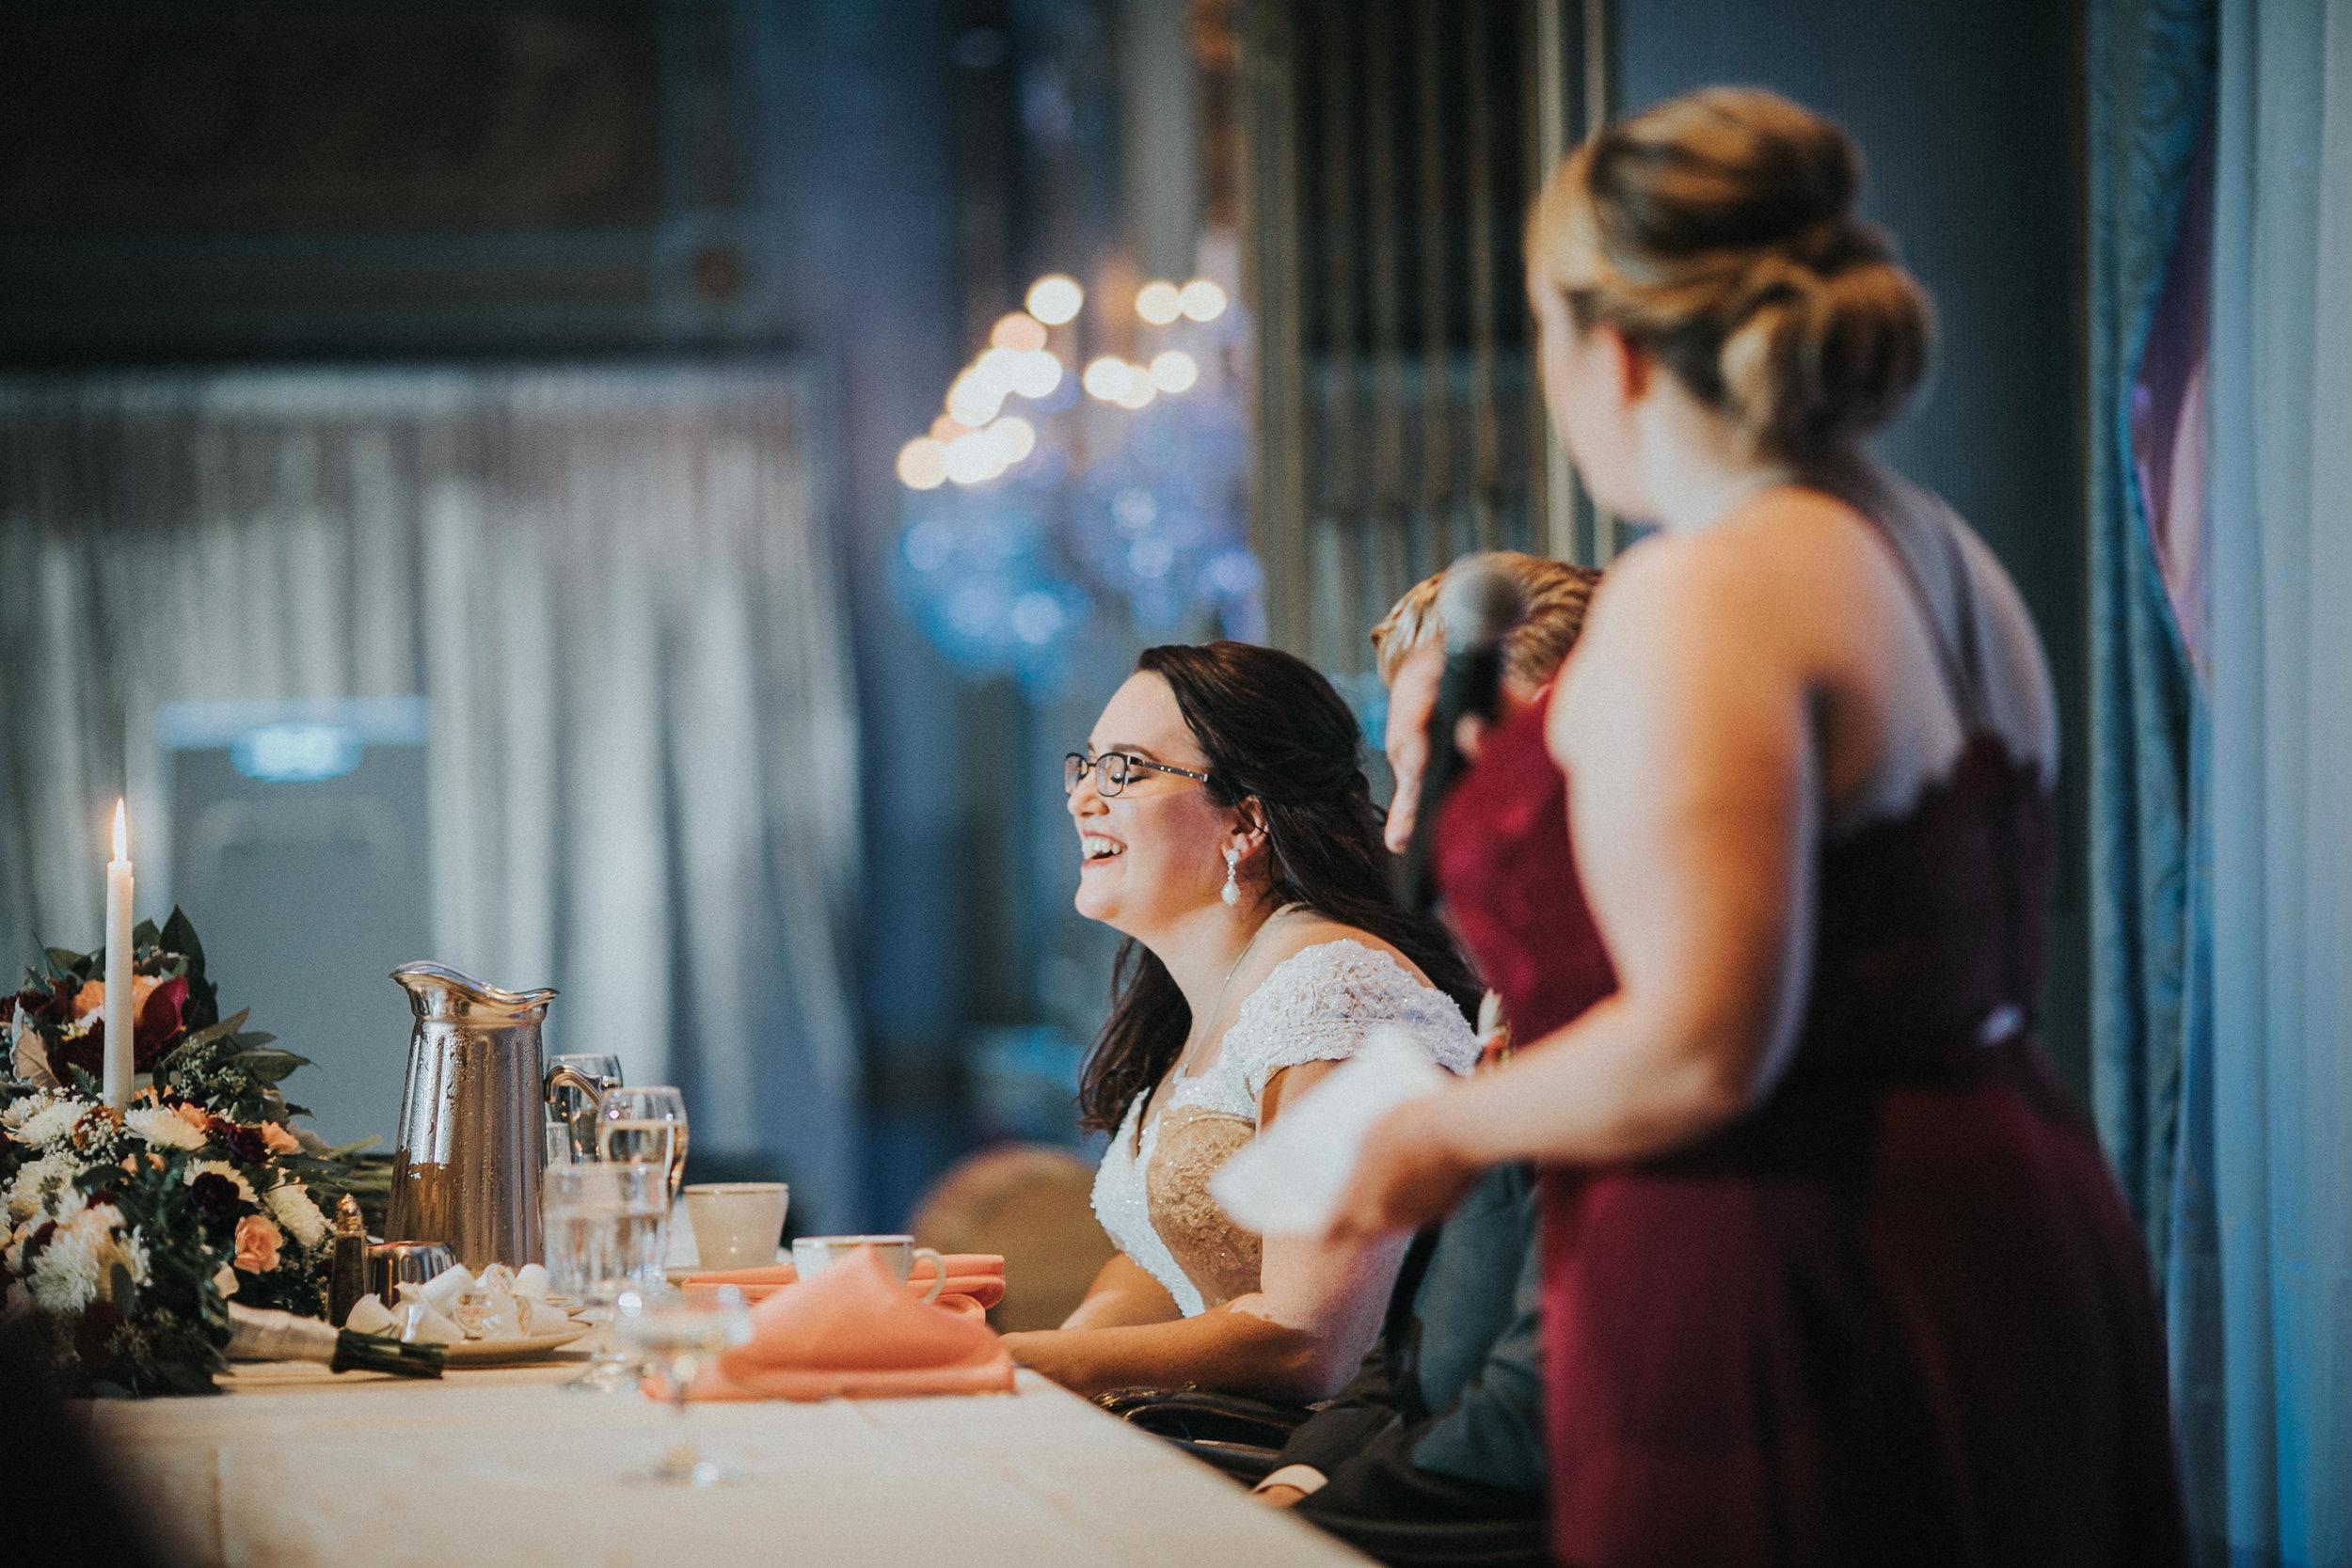 New-Jersey-Wedding-Photography-Fishers-Tudor-House-JennaLynnPhotography-Reception-Kathleen&Eddie-138.jpg